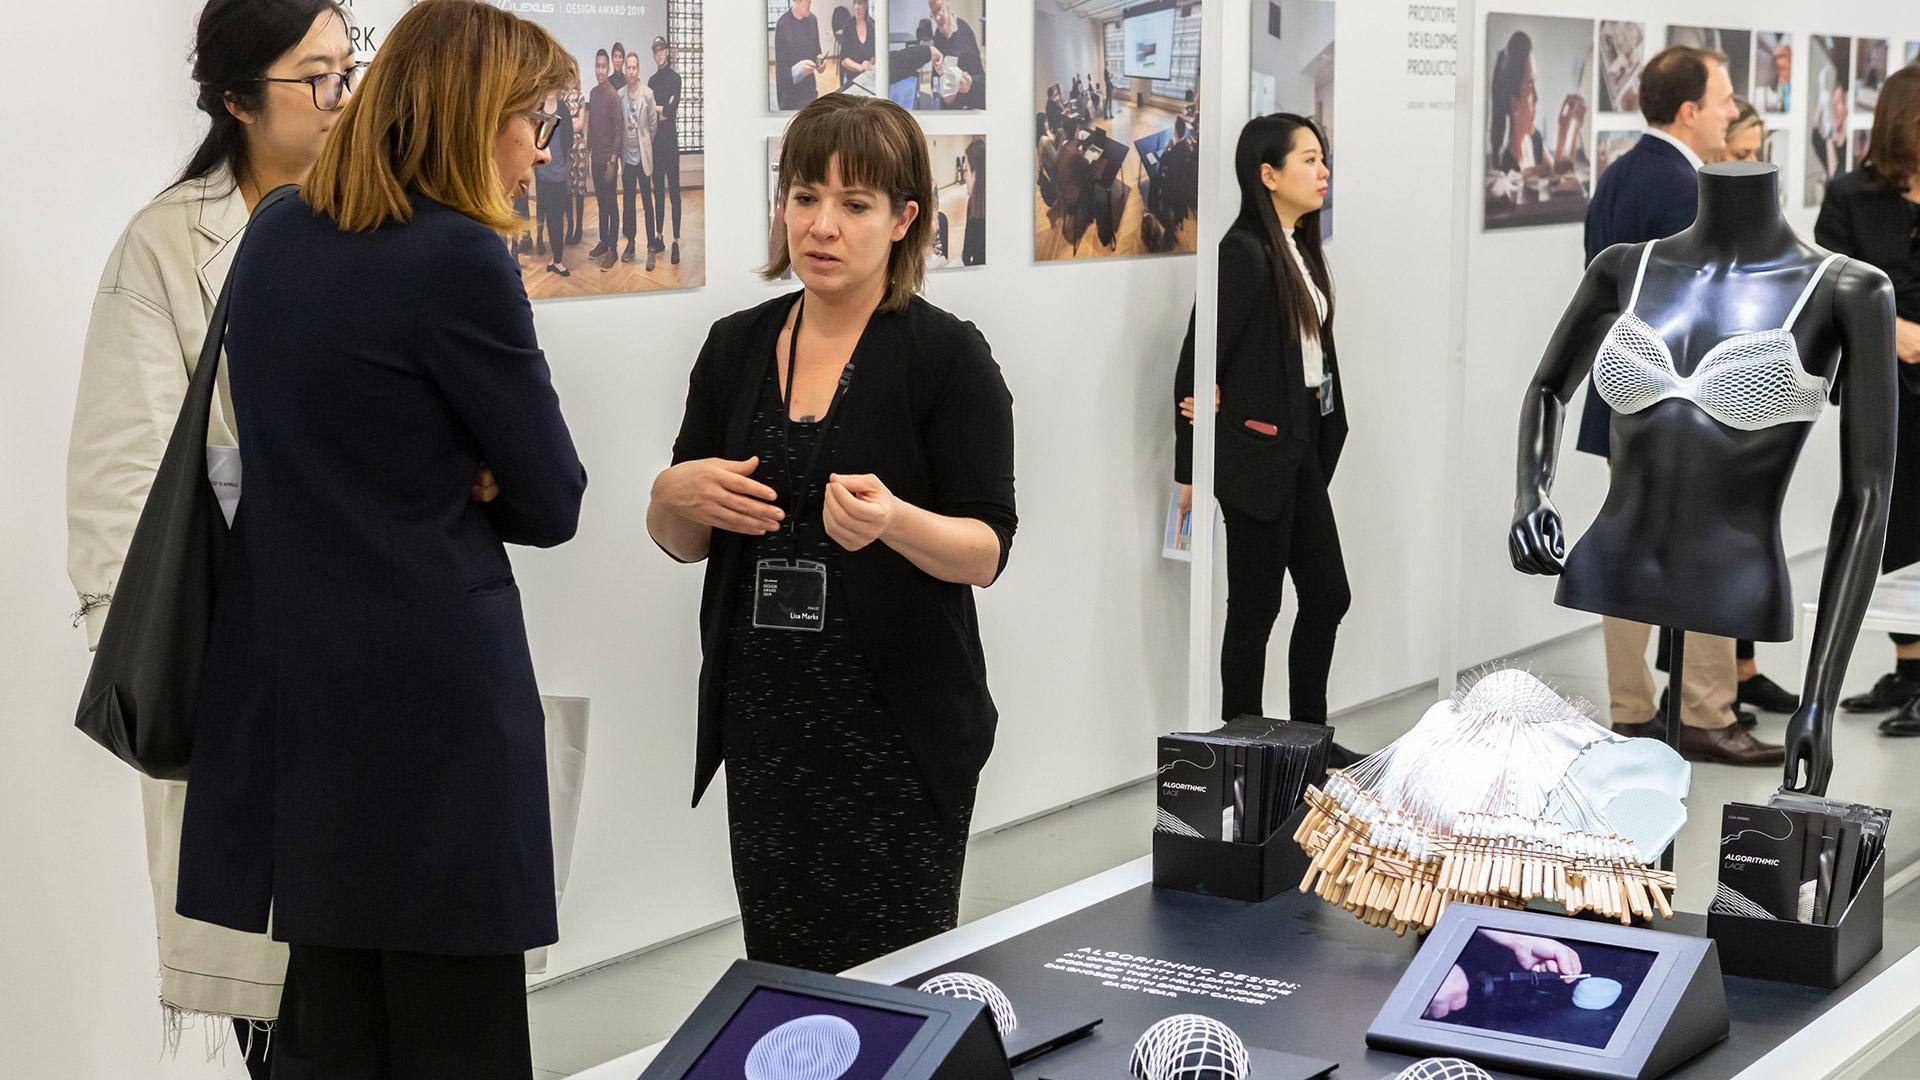 2019 lexus design awards gallery 03